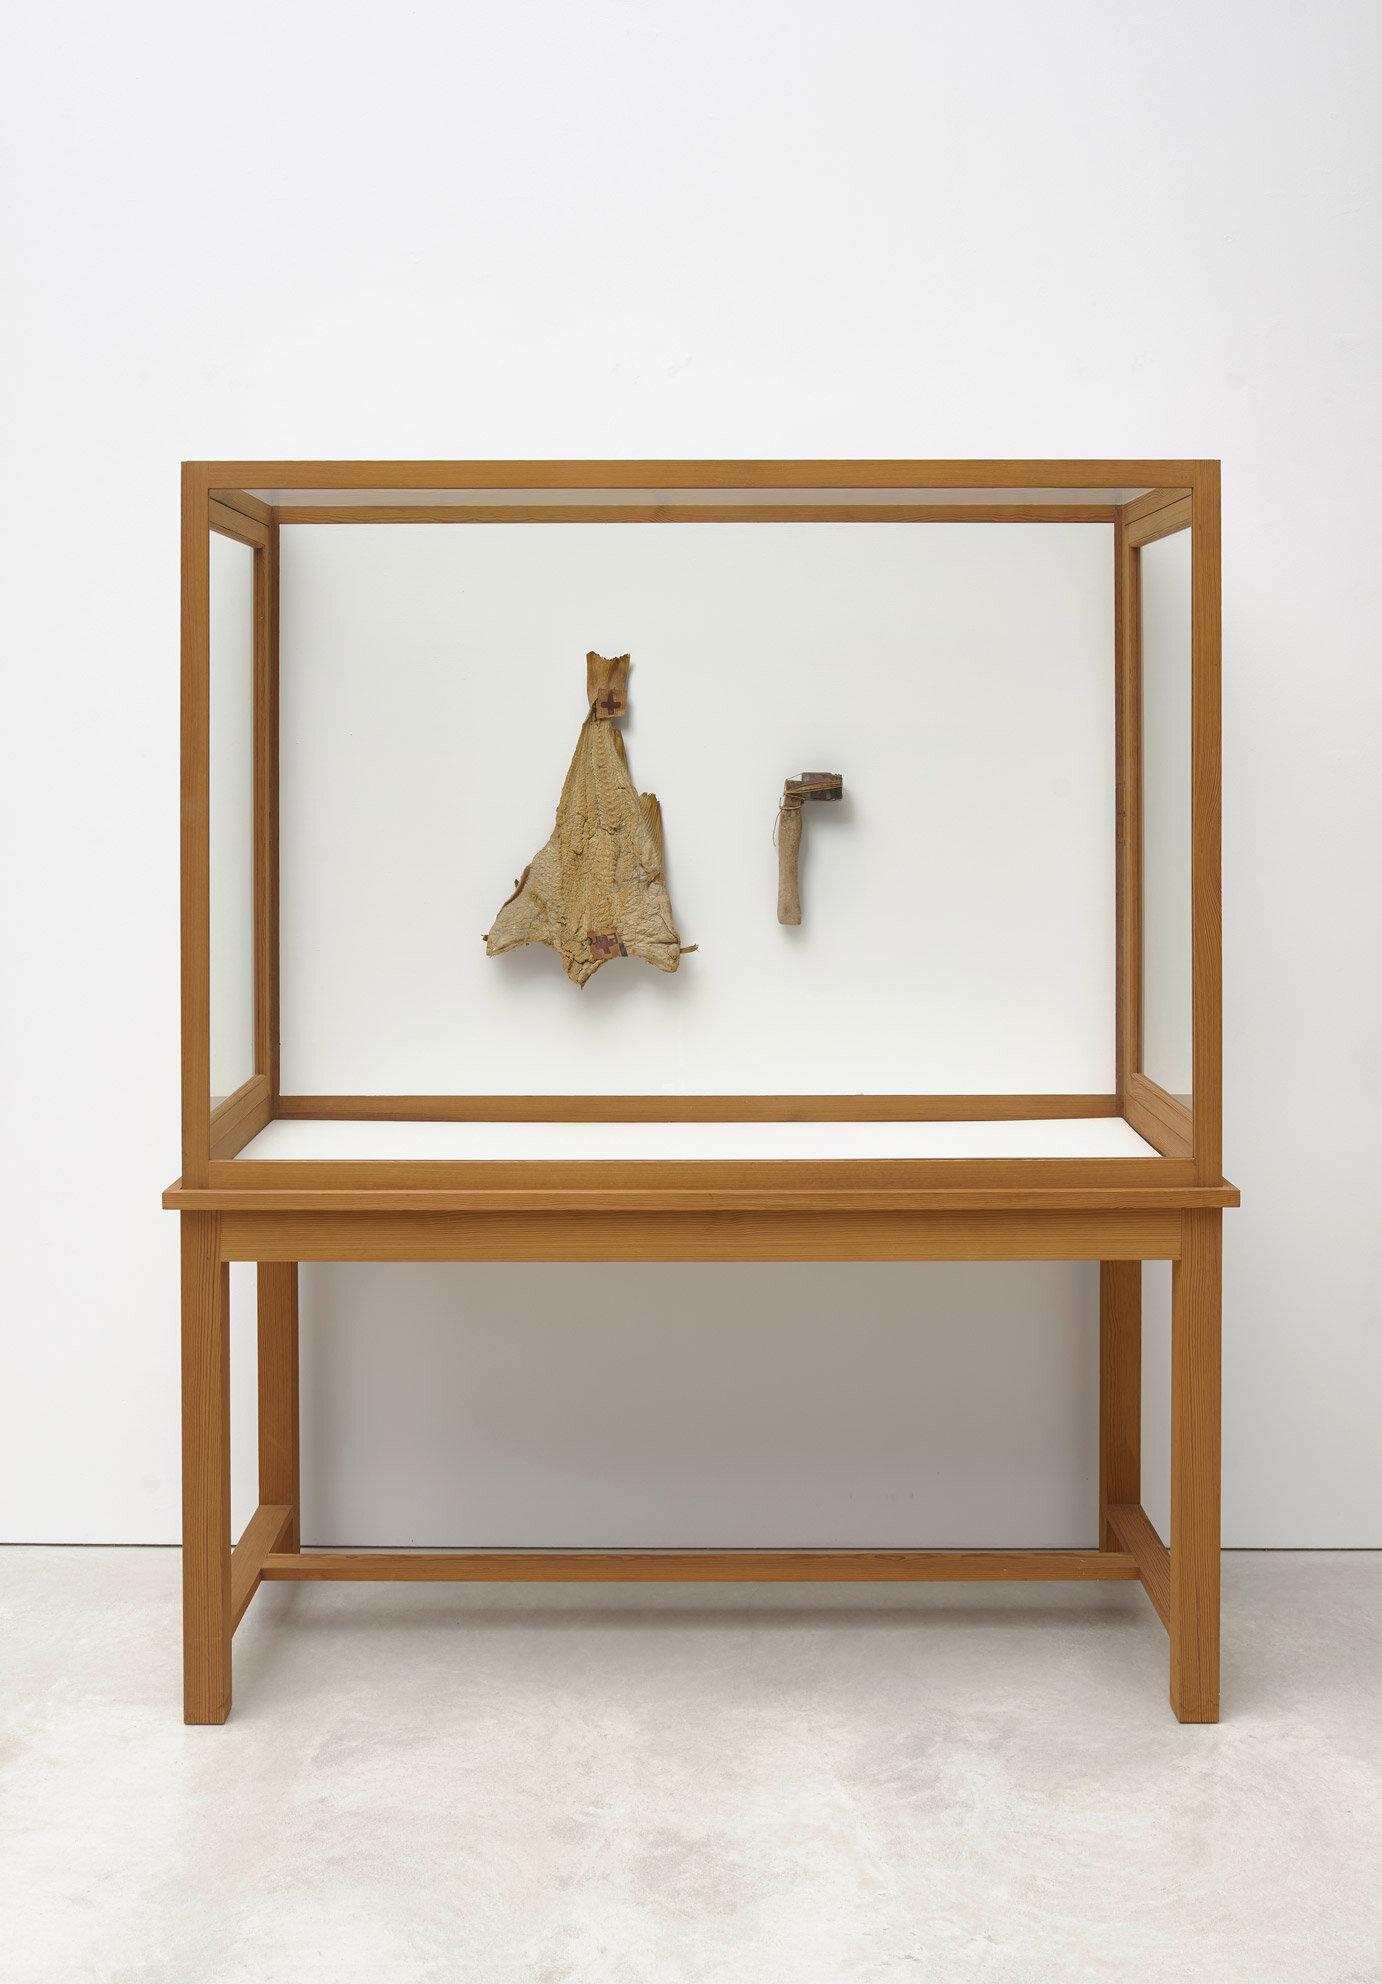 LE-MILE-Magazine-written-Tgen-Donovan-BASTIAN-Gallery-London-Joseph-Beuys,-Hammer-for-the-Hard-of-Hearing,-1959-60-(2).jpg